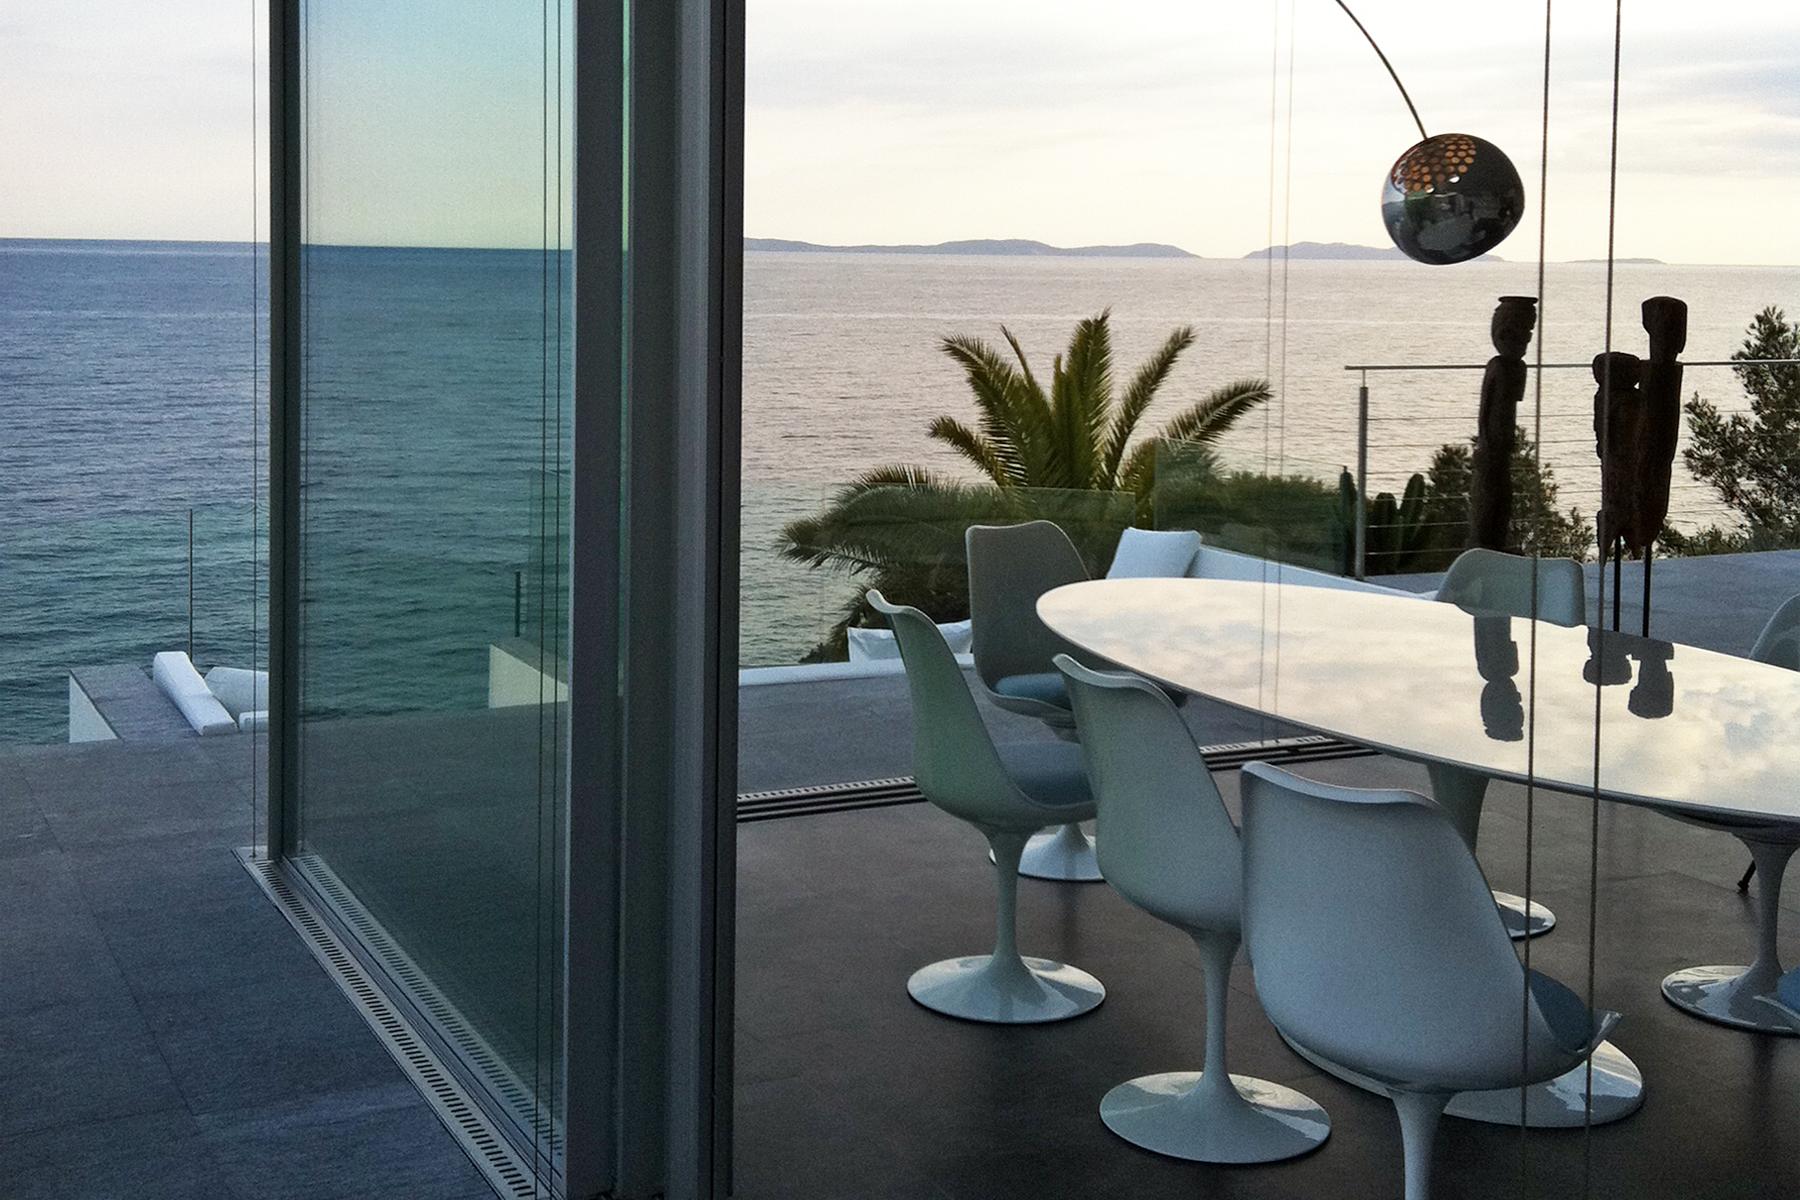 Florence_Watine_Architecte_Designer_Decoratrice_Paris_France_Villa_G1